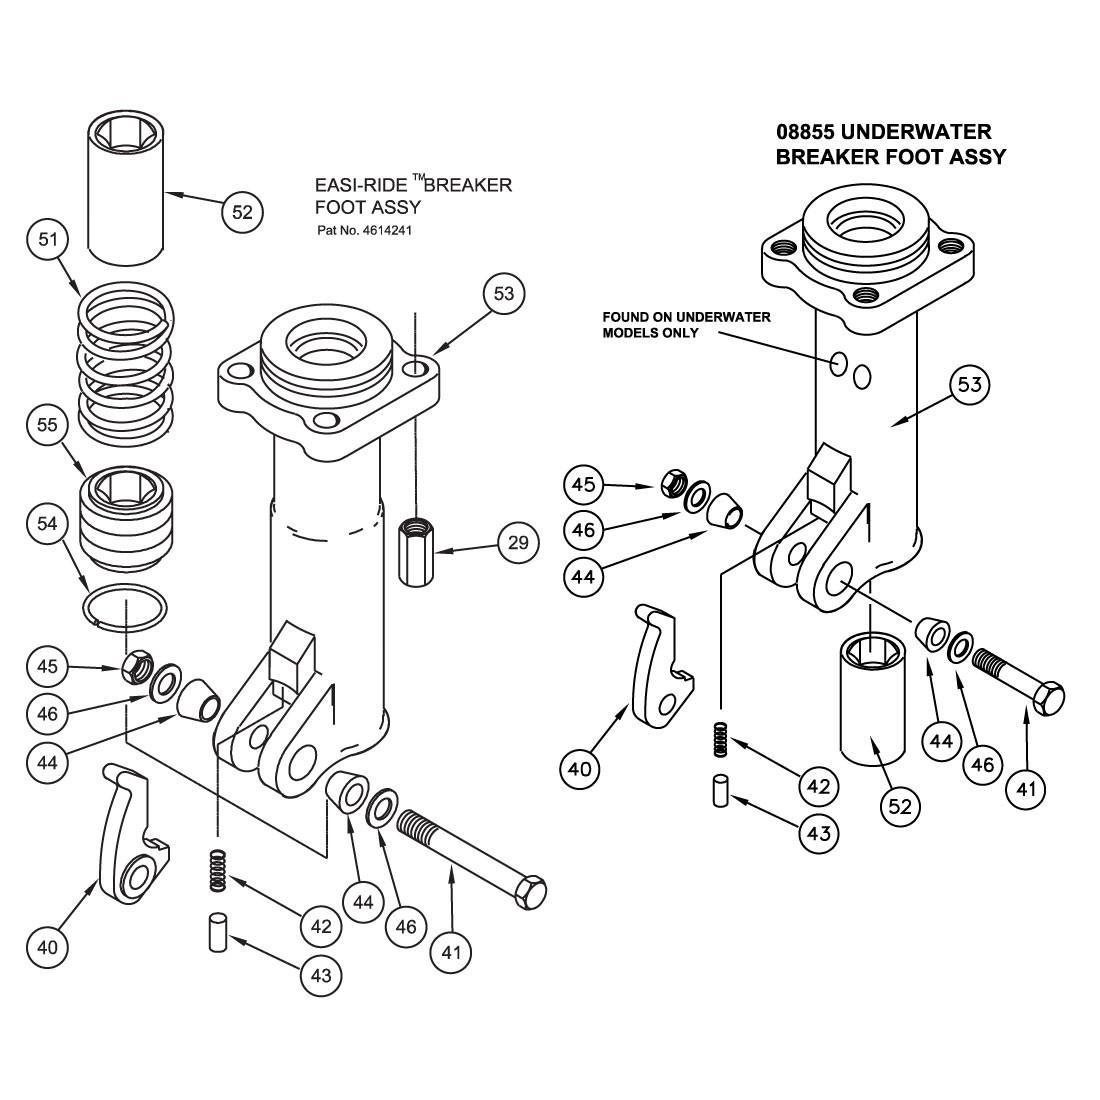 Stanley BR87 Foot Parts Illustration